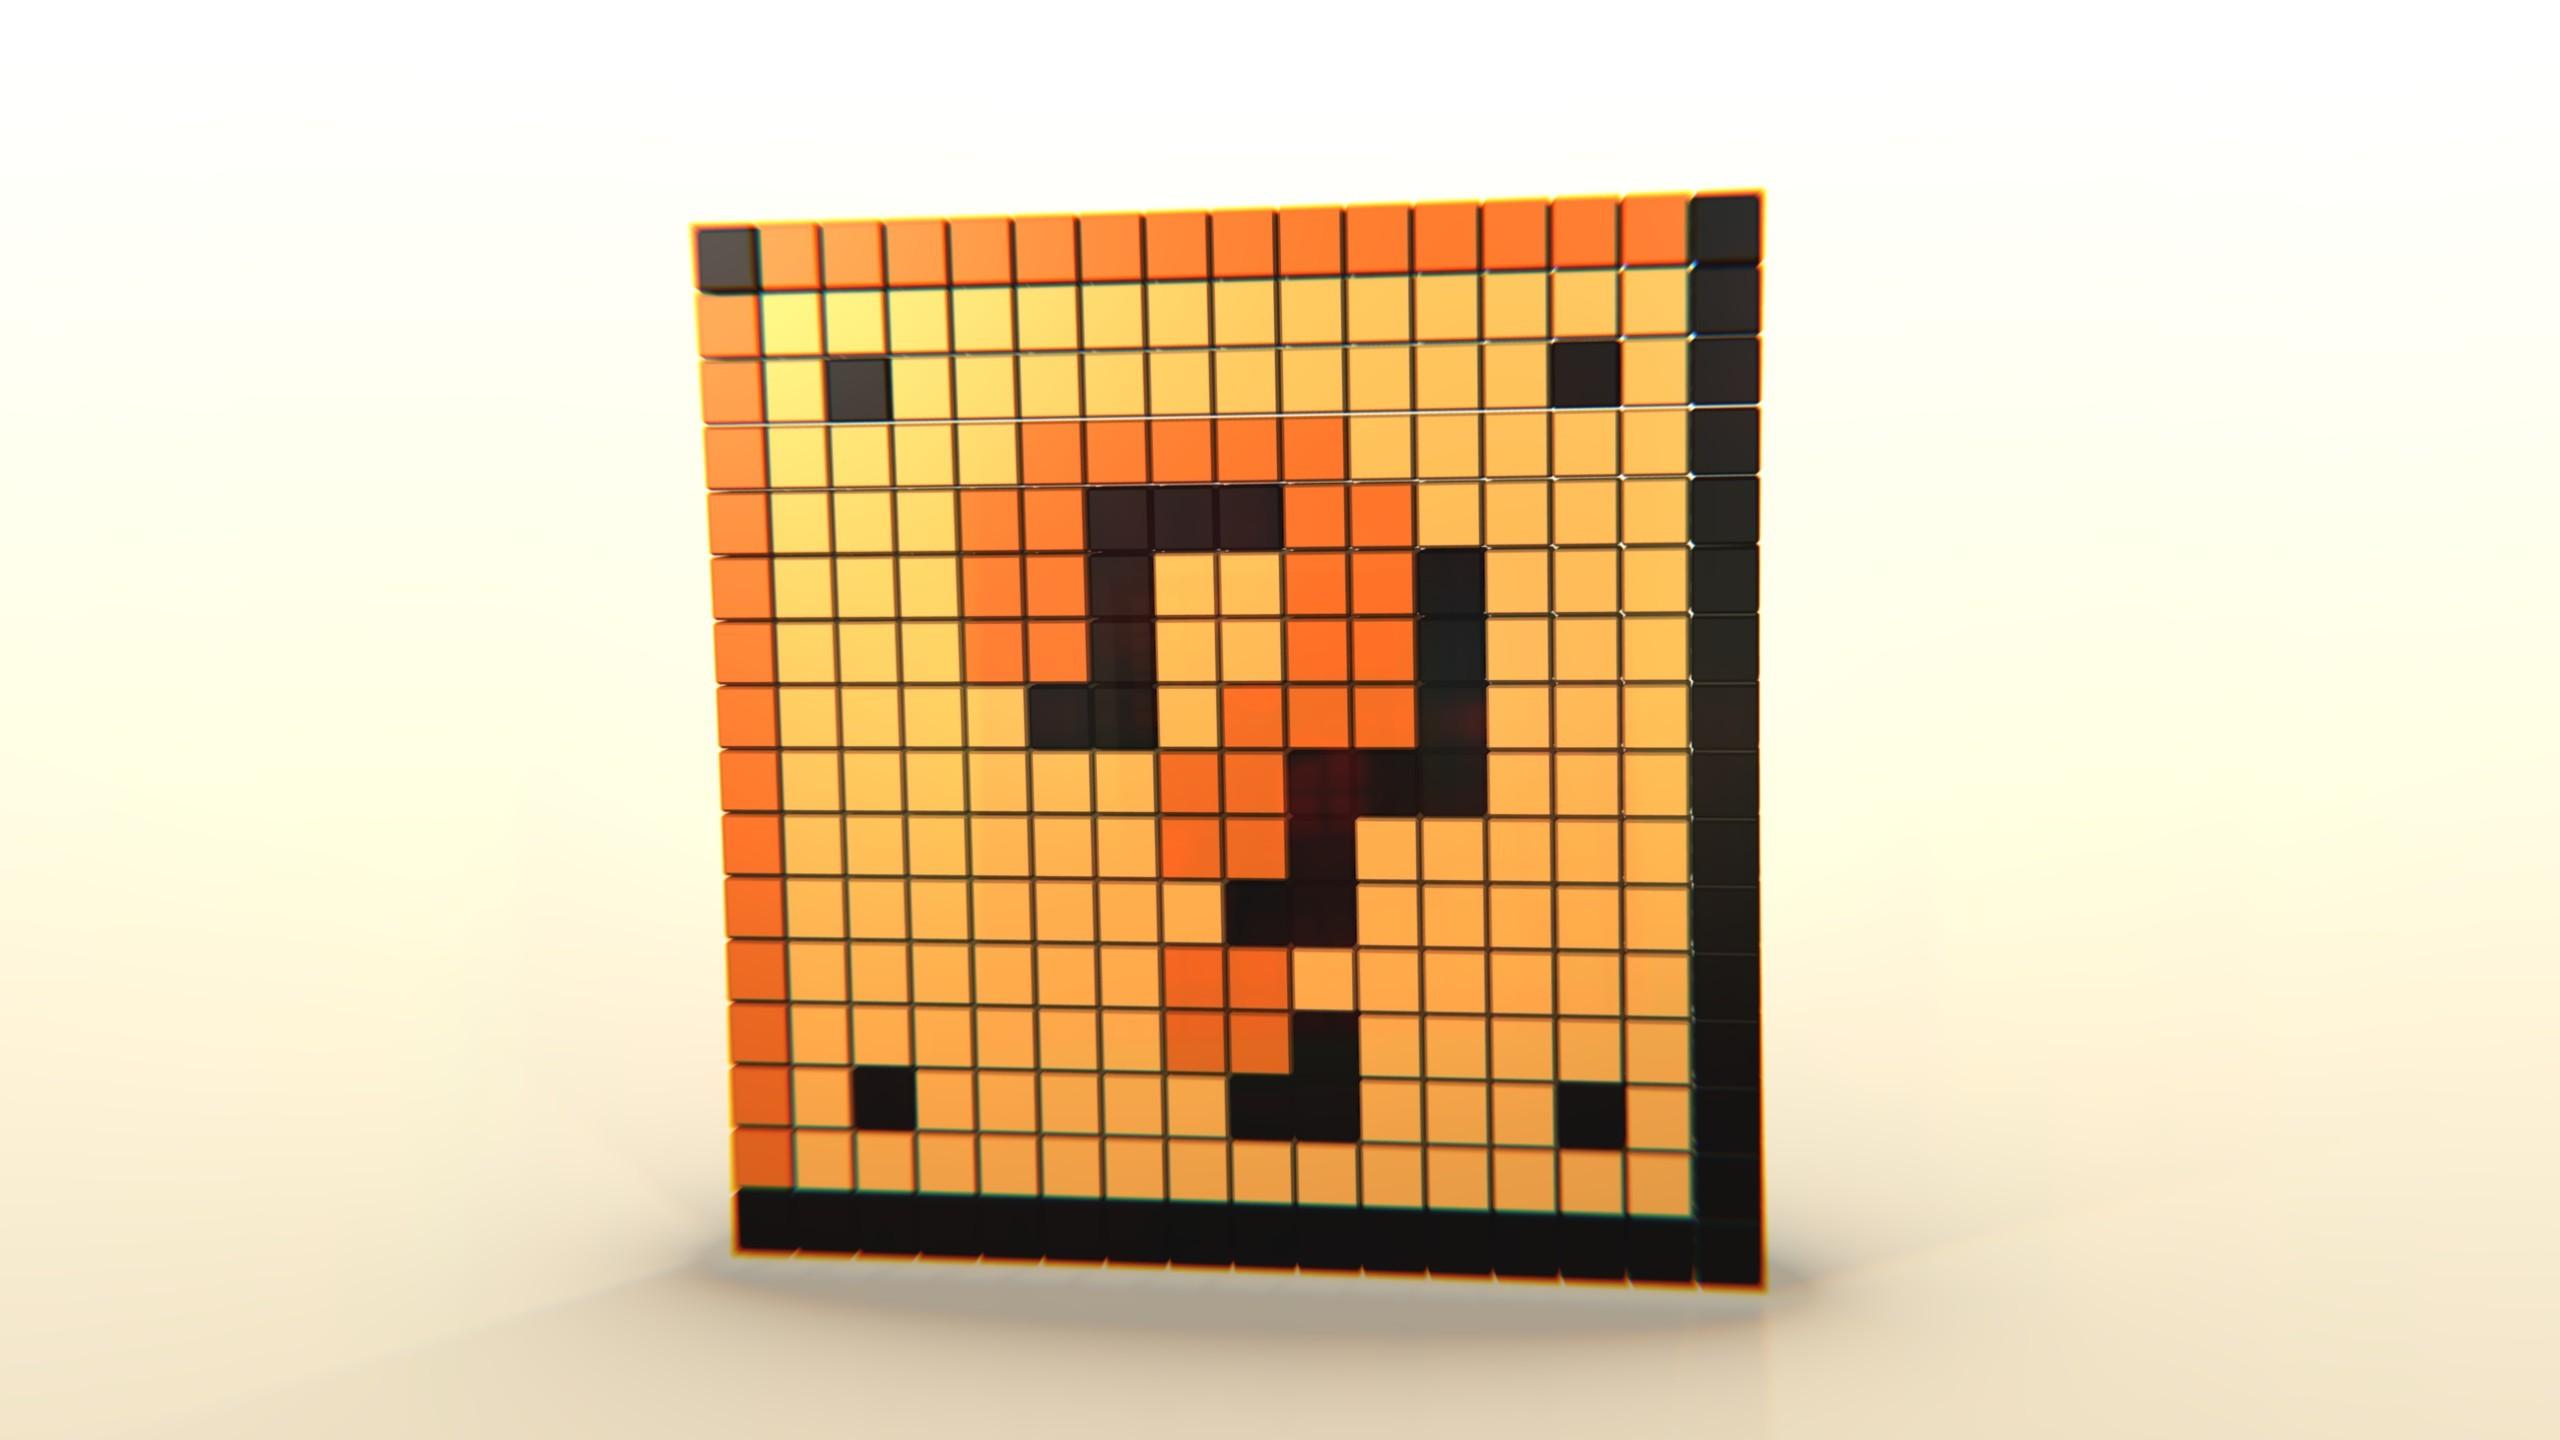 … thekingofthevikings 8-Bit Question Box by thekingofthevikings